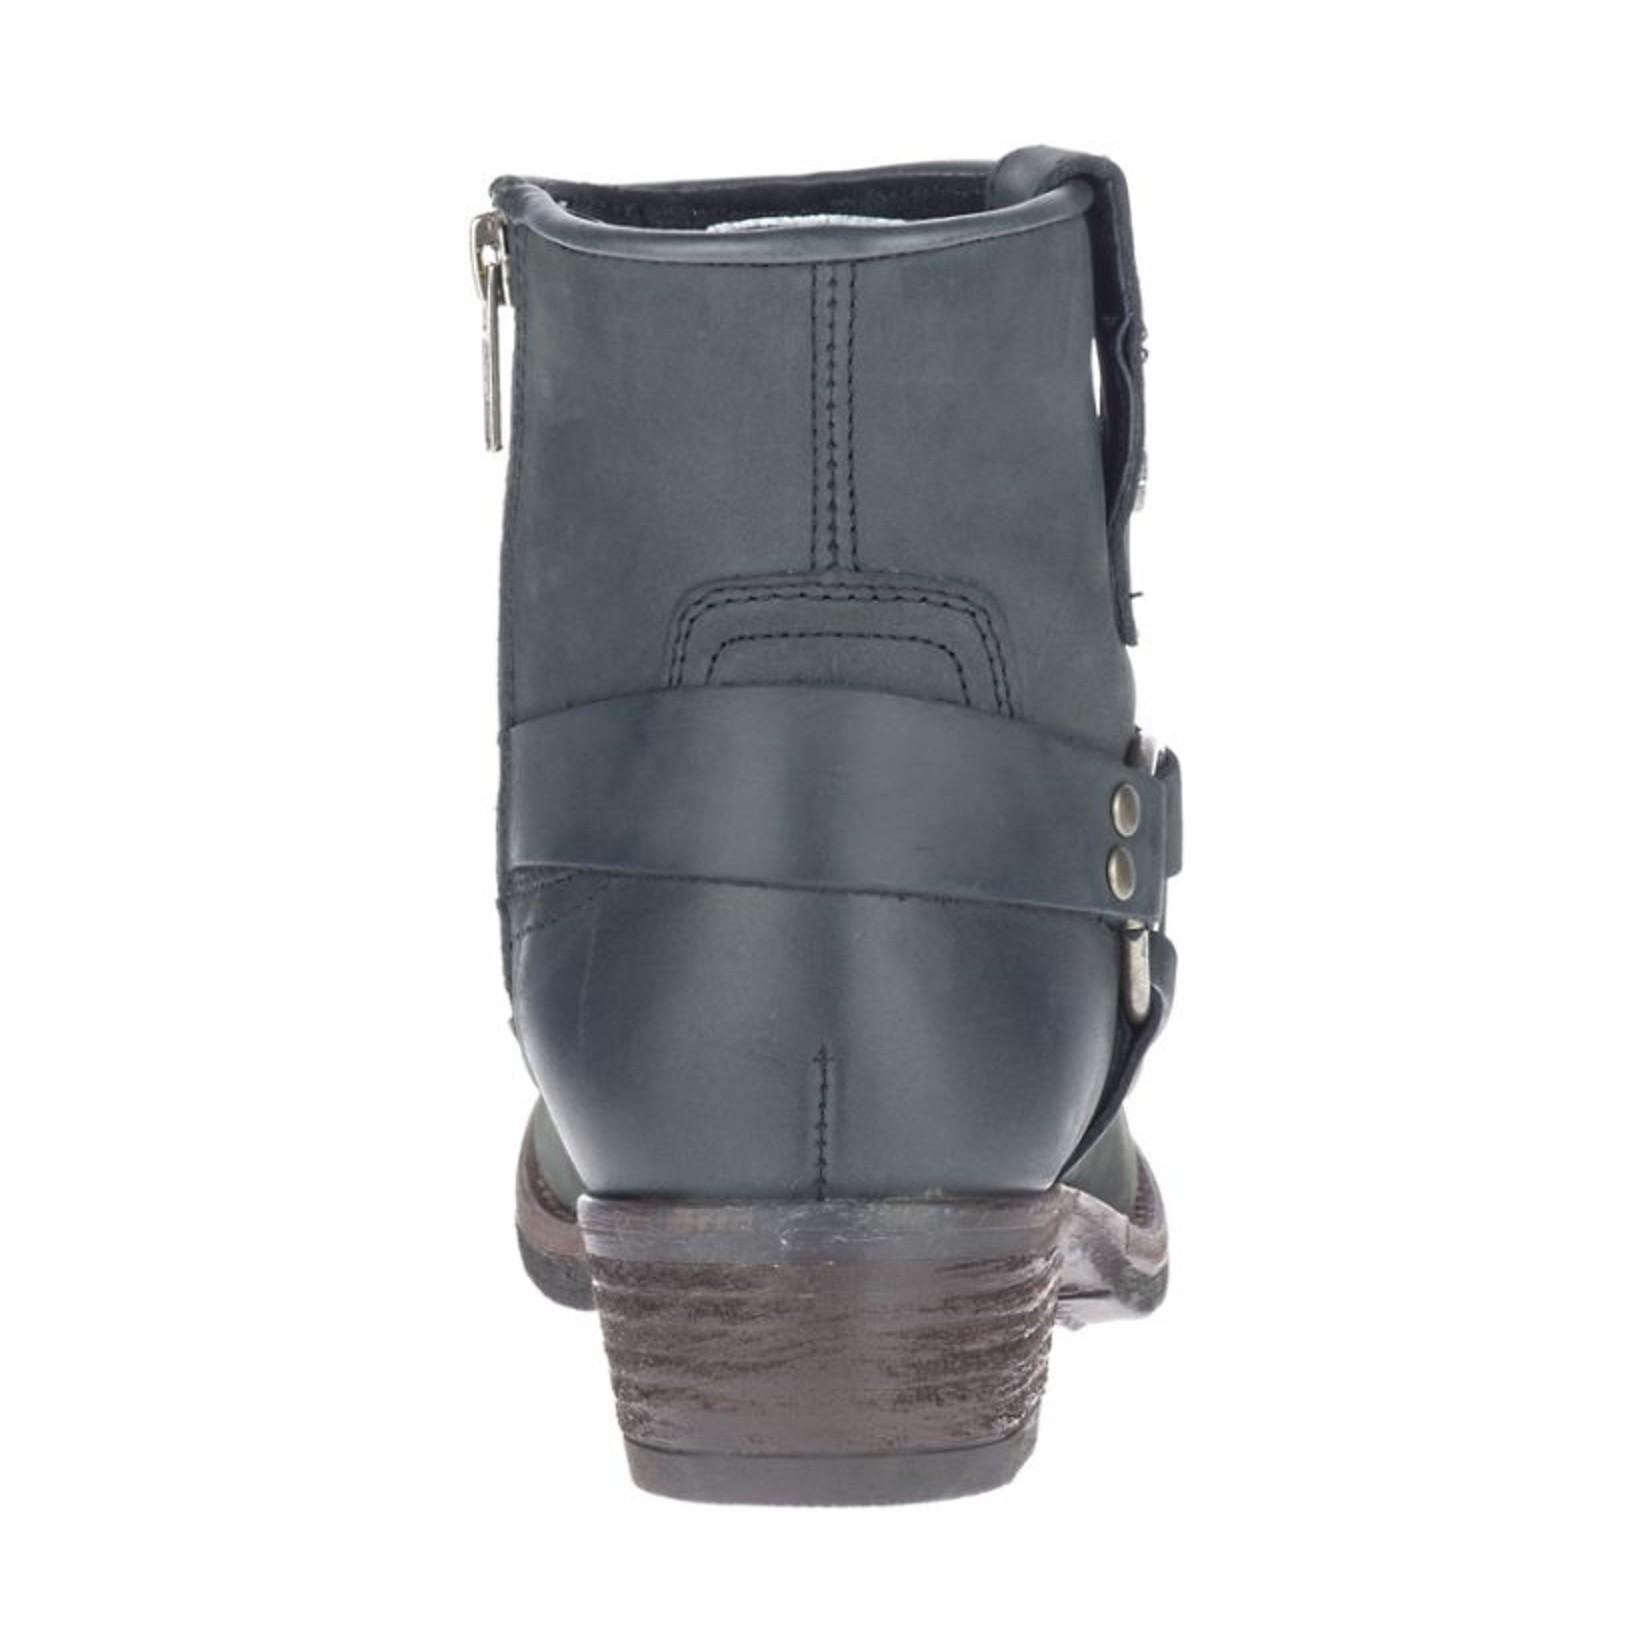 Harley Women's Harley Abbington Side Zip harness boot 84493